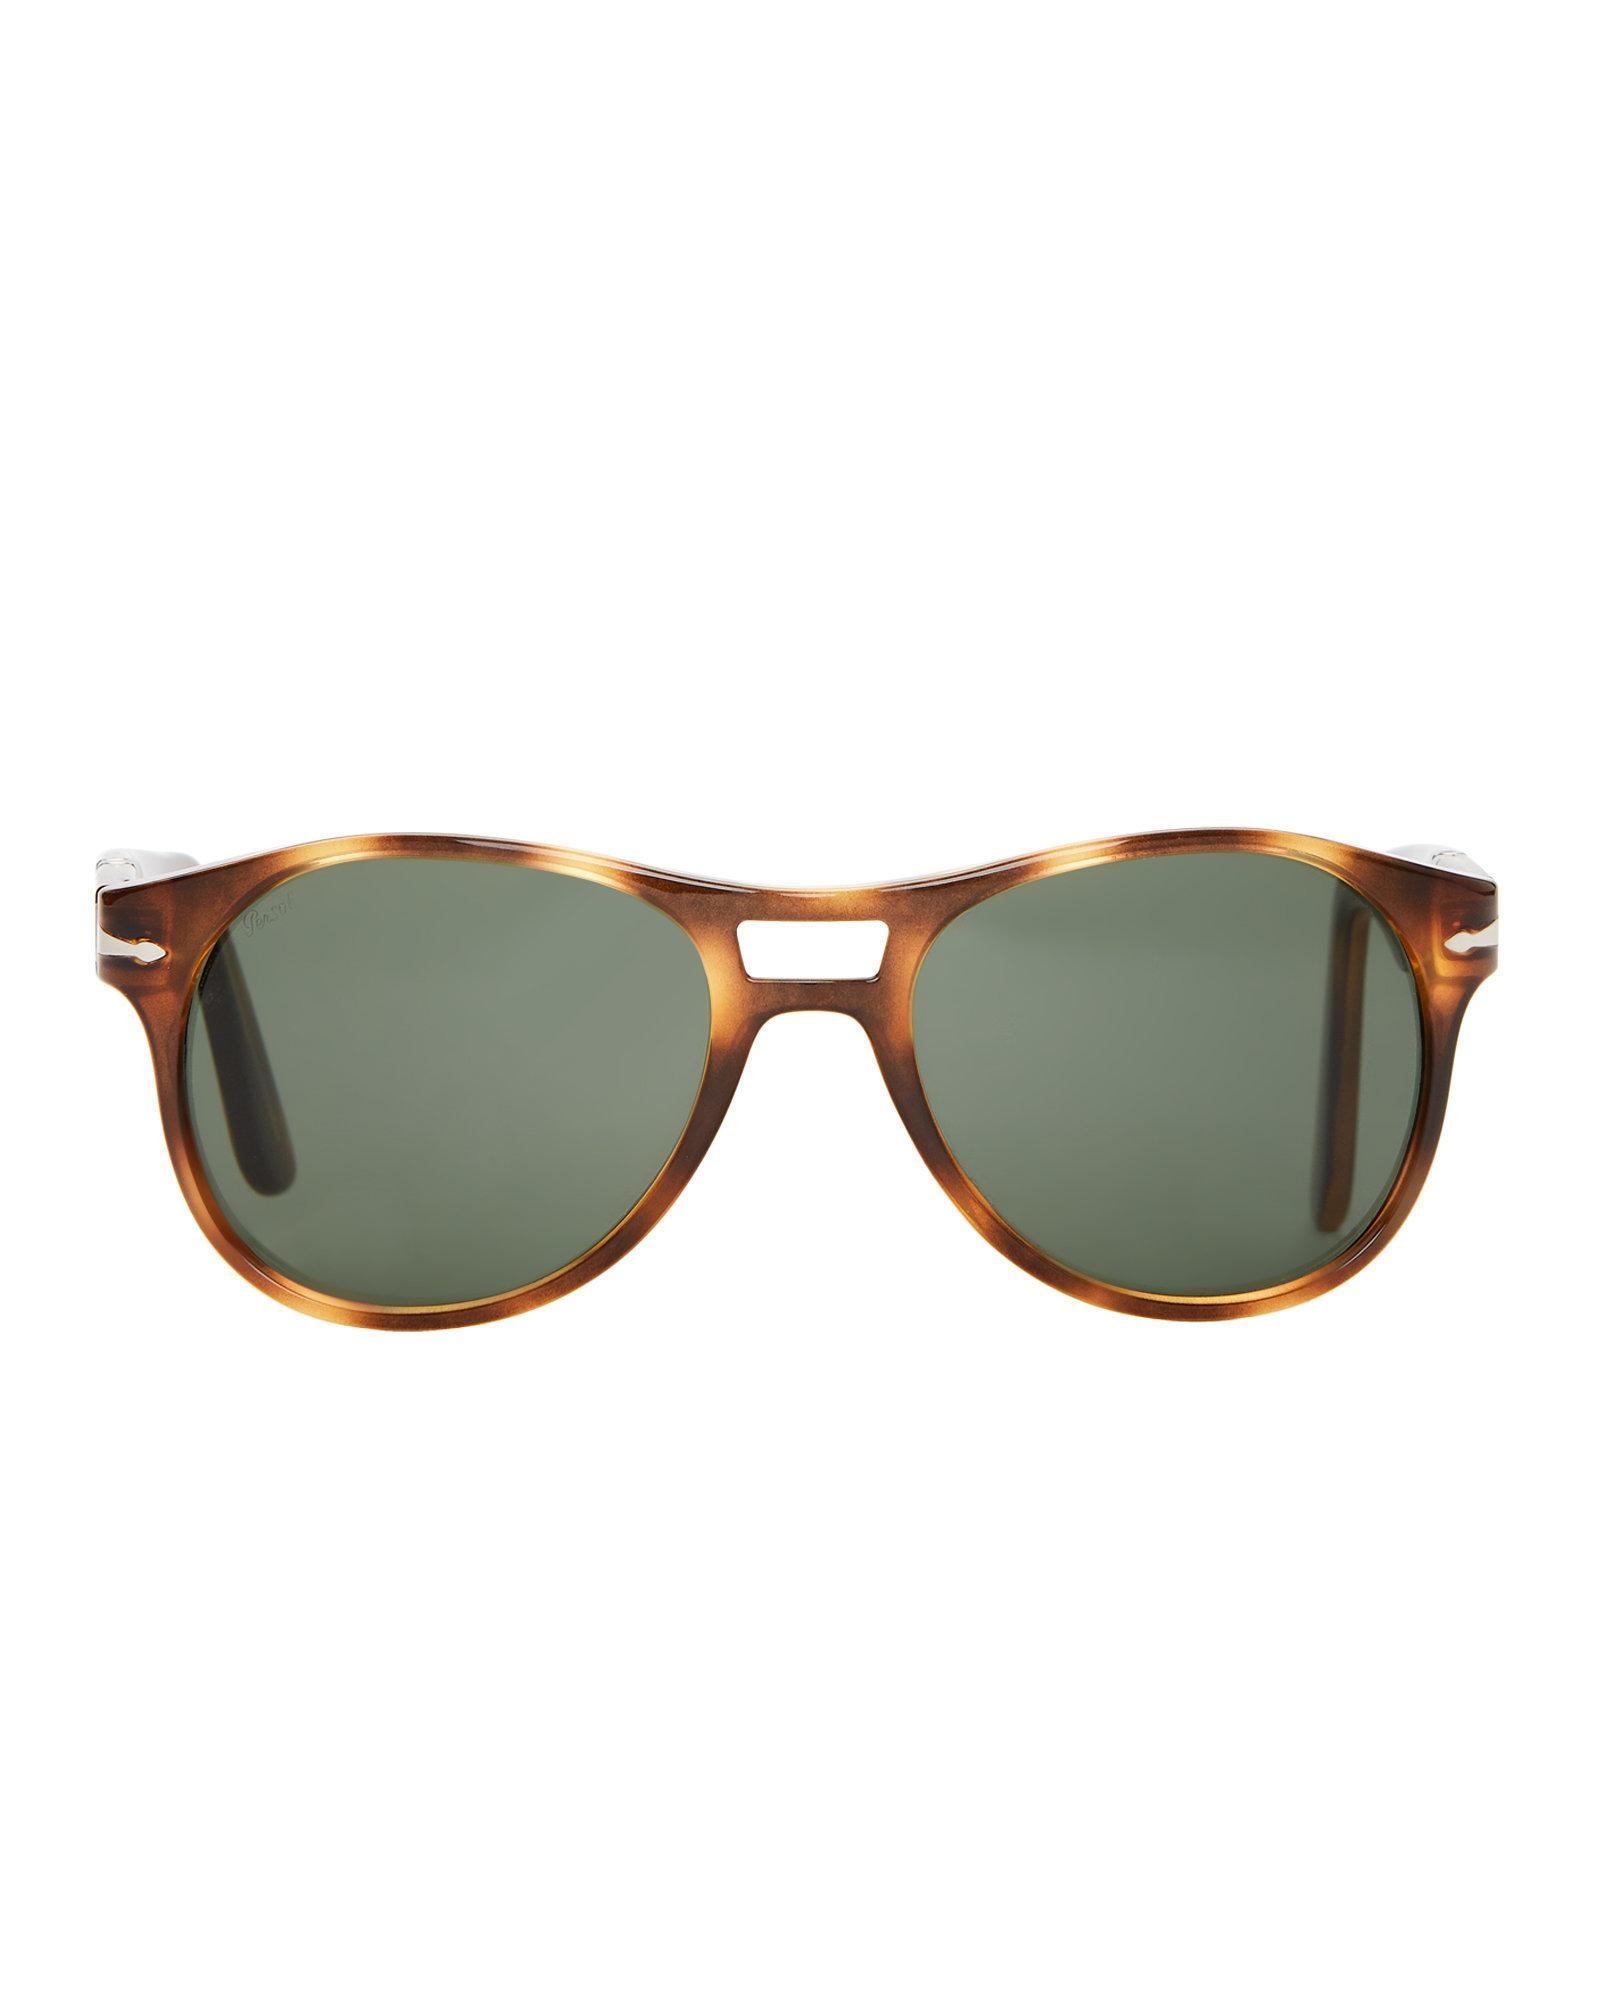 9e9193ed23 Lyst - Persol Tortoiseshell-look Po3155 Aviator Sunglasses